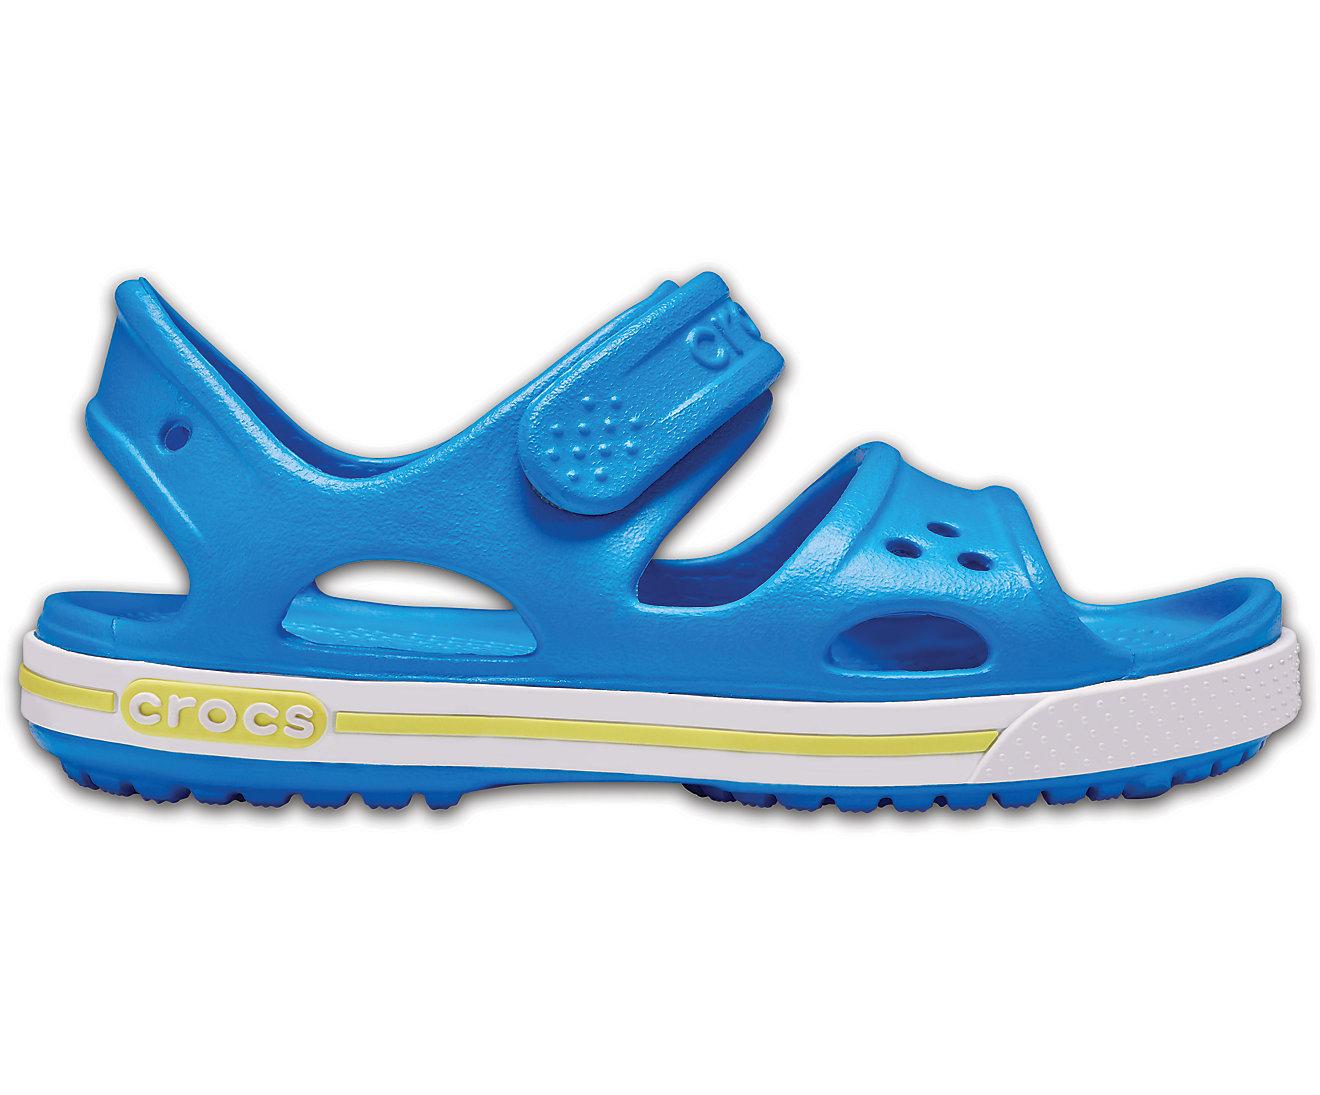 9778c1c4168 Crocs Crocband II Sandal 23-24 (C7)   Ocean Tennis Ball Green - Glami.cz